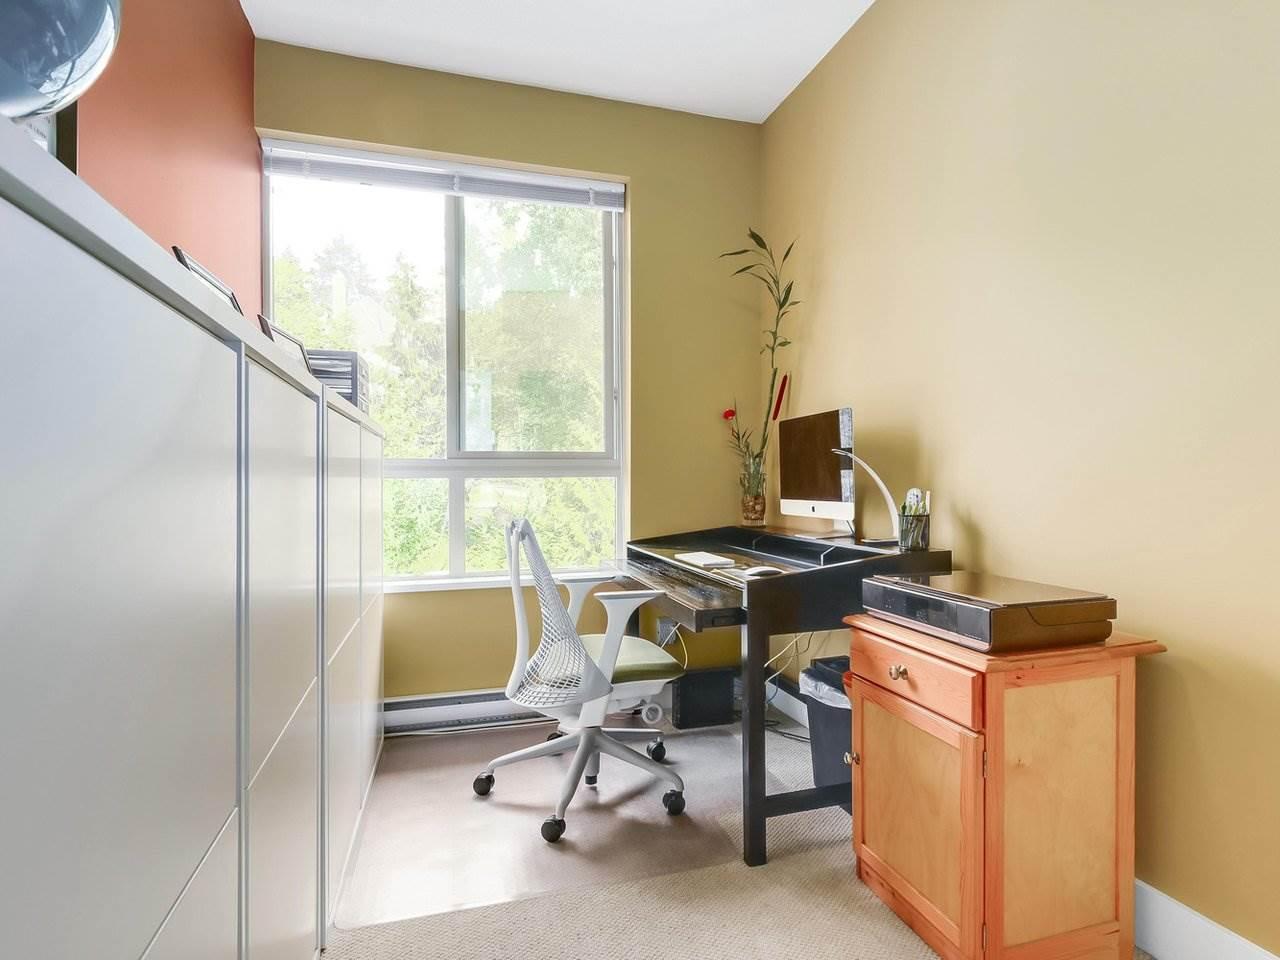 Condo Apartment at 602 7488 BYRNEPARK WALK, Unit 602, Burnaby South, British Columbia. Image 11